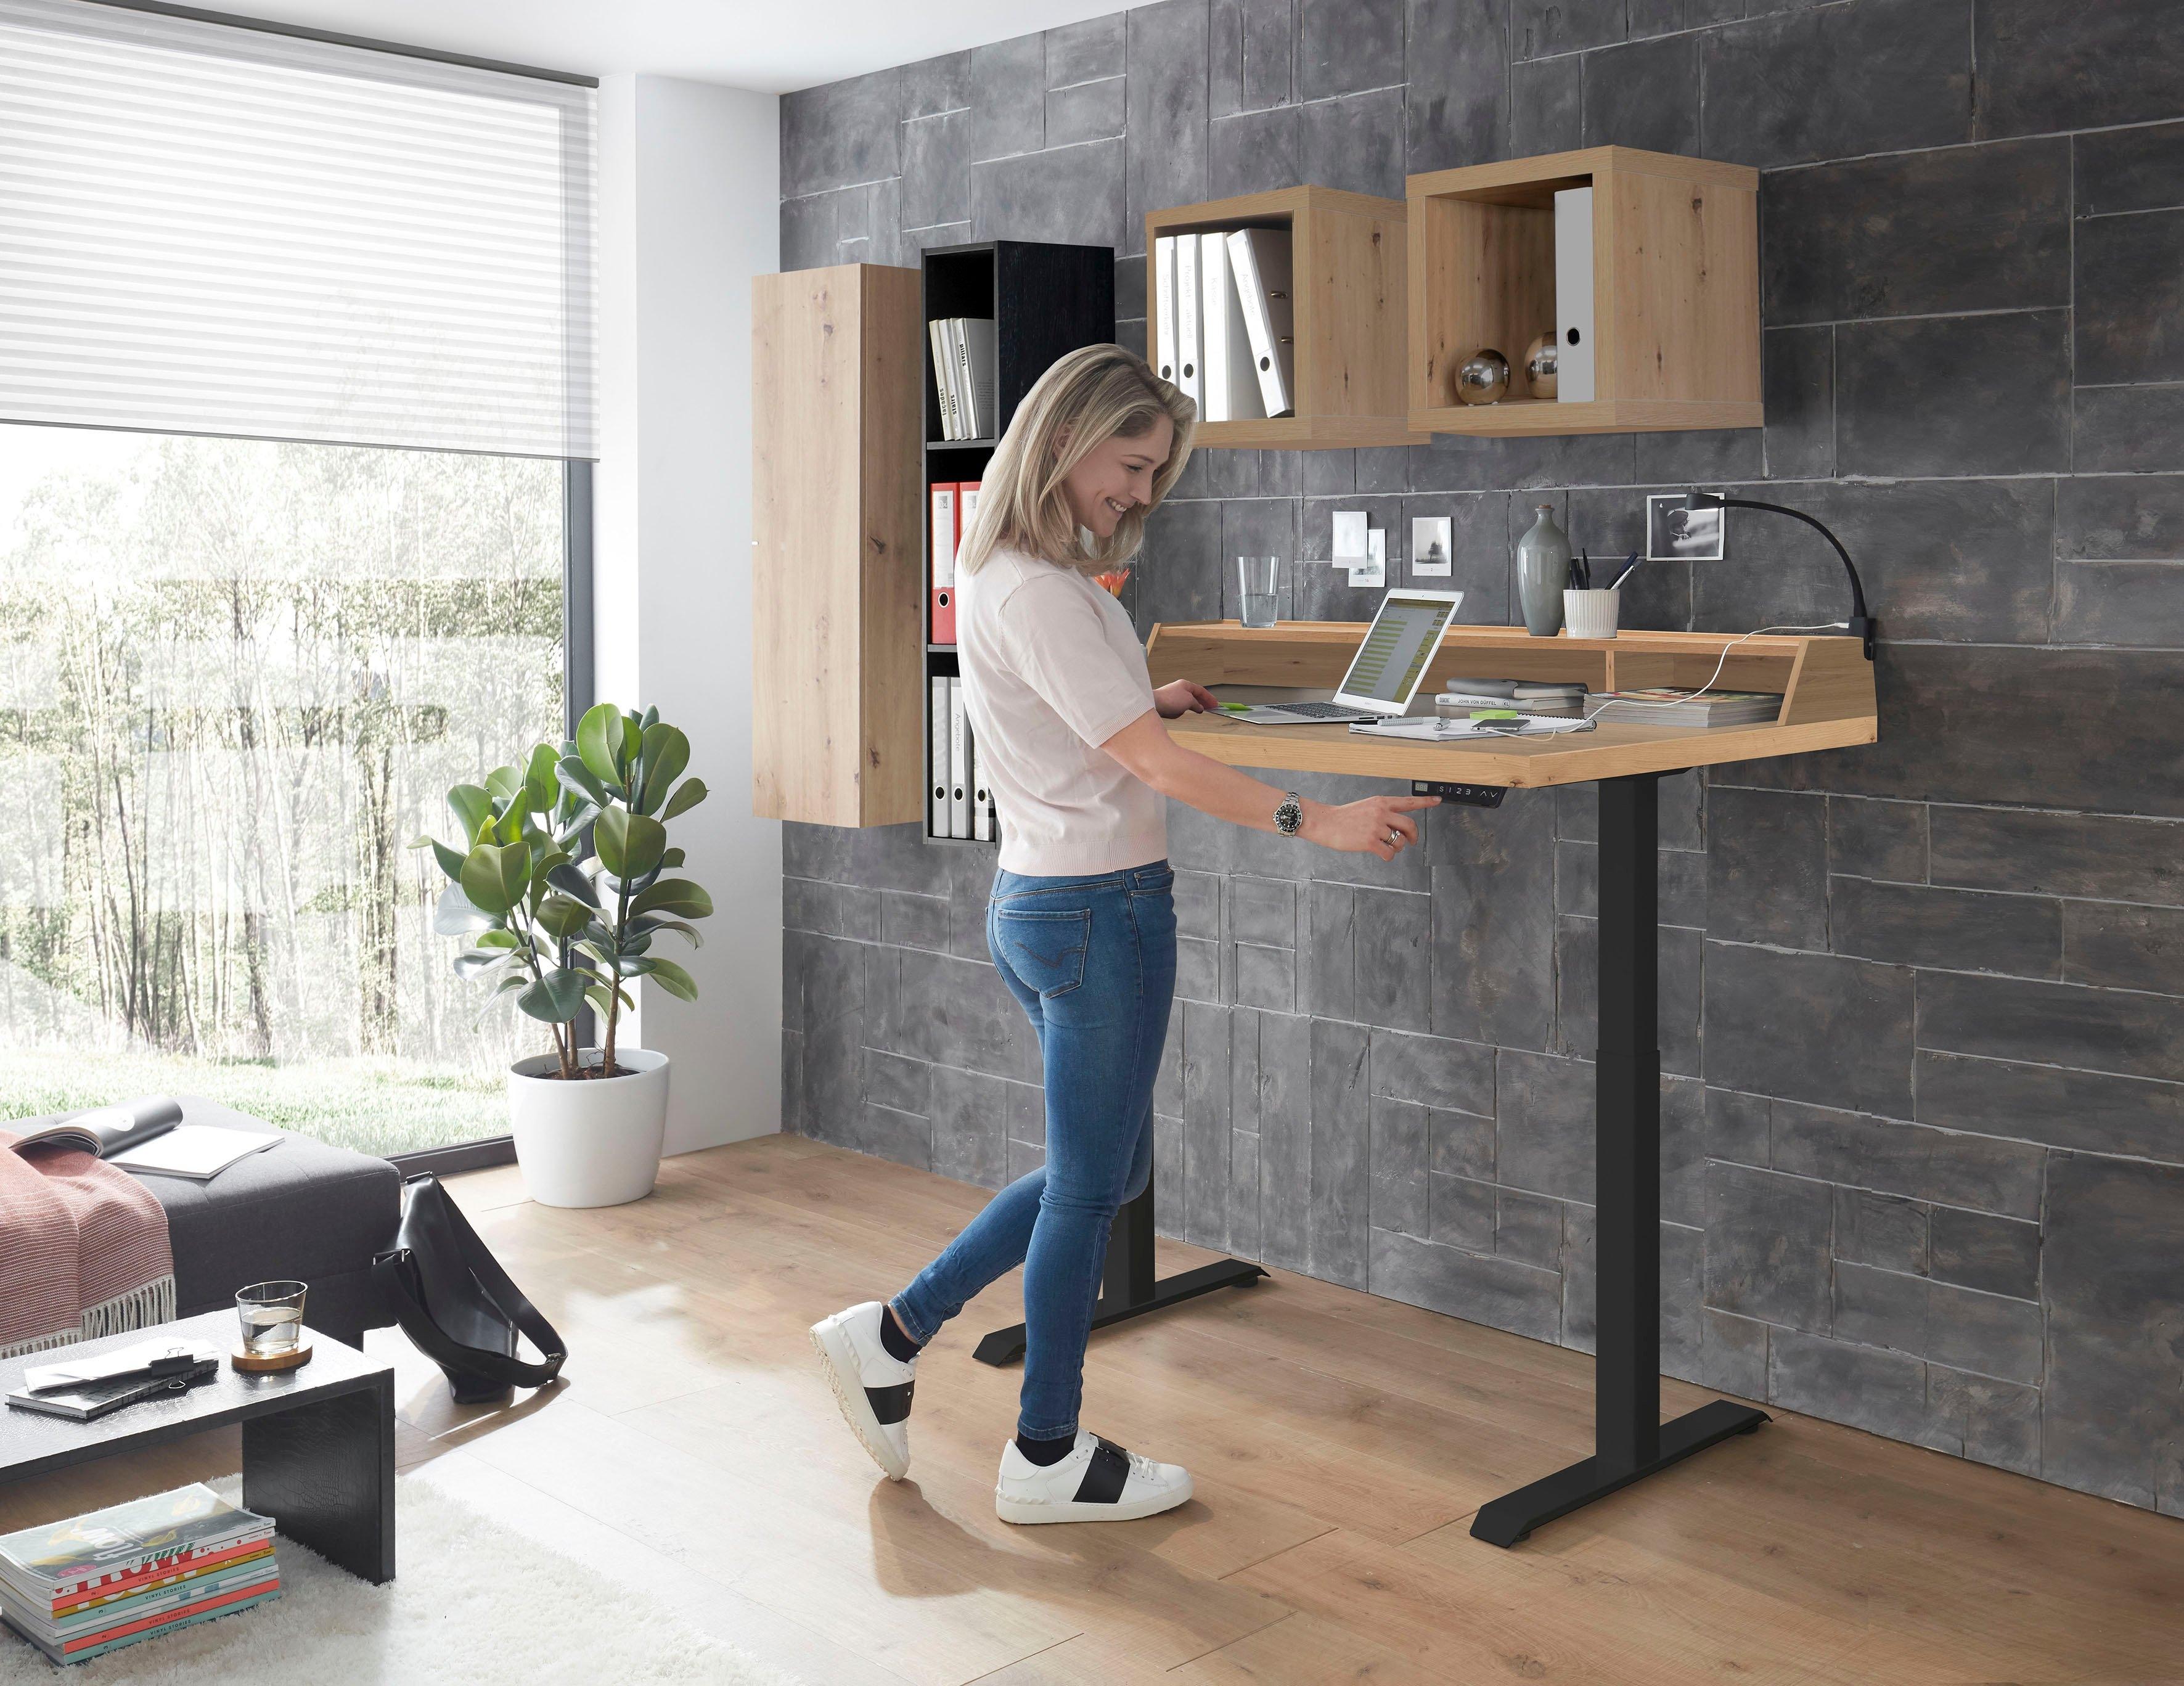 bureau Big System Office Breedte 120 cm, elektrisch in hoogte verstelbaar nu online bestellen